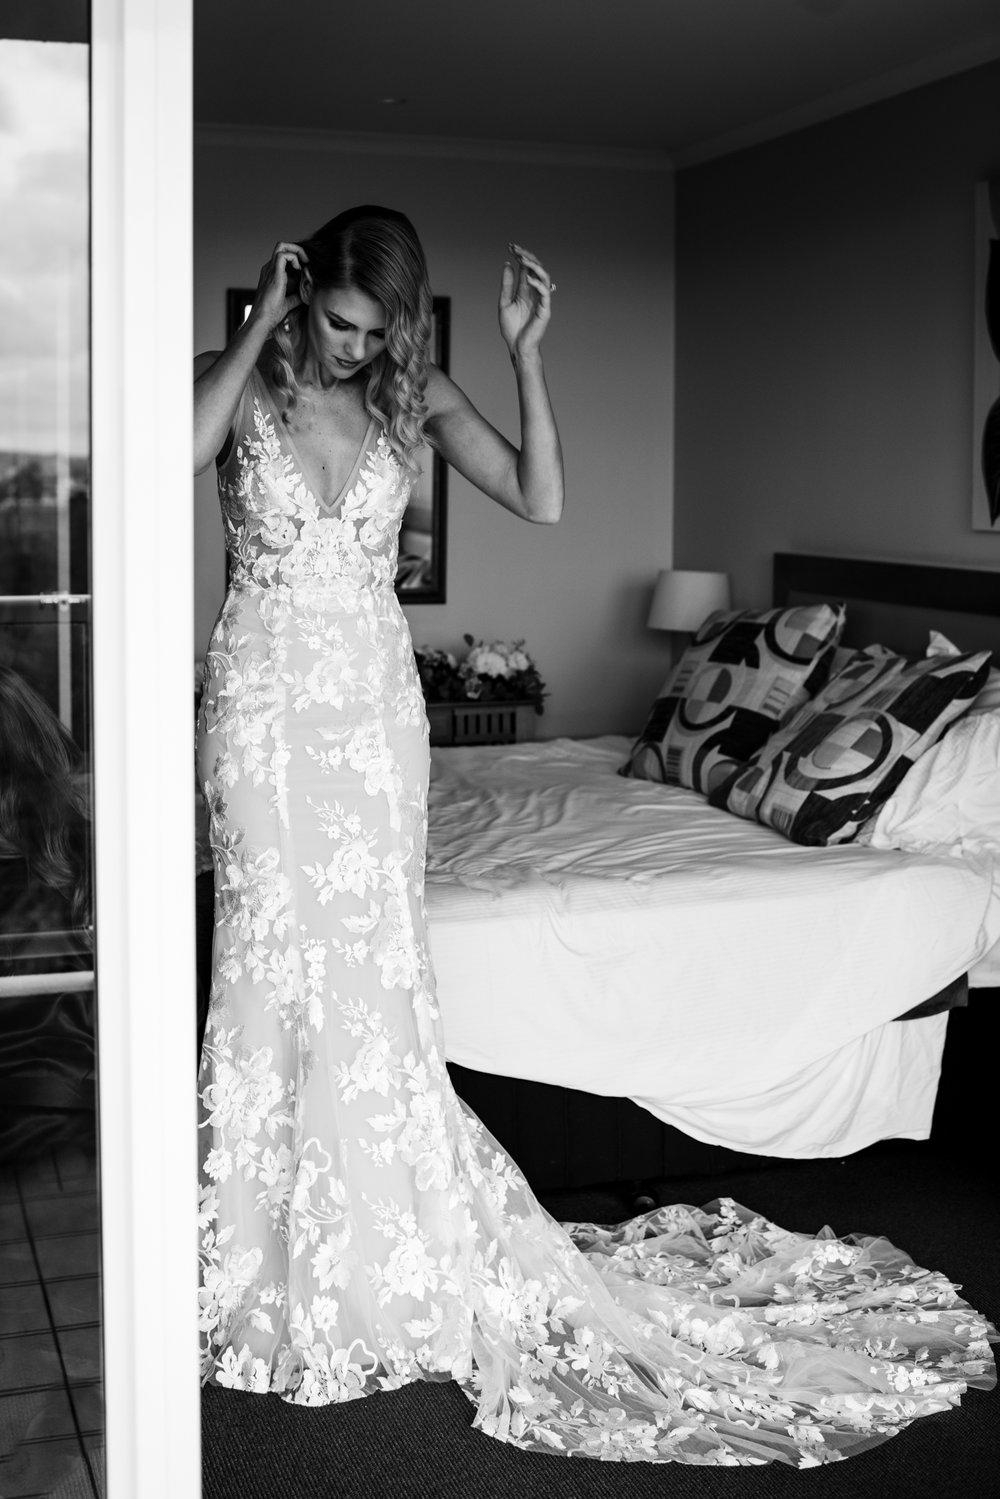 Brisbane Wedding Photographer | Engagement-Elopement Photography | Factory51-City Botantic Gardens Wedding-13.jpg